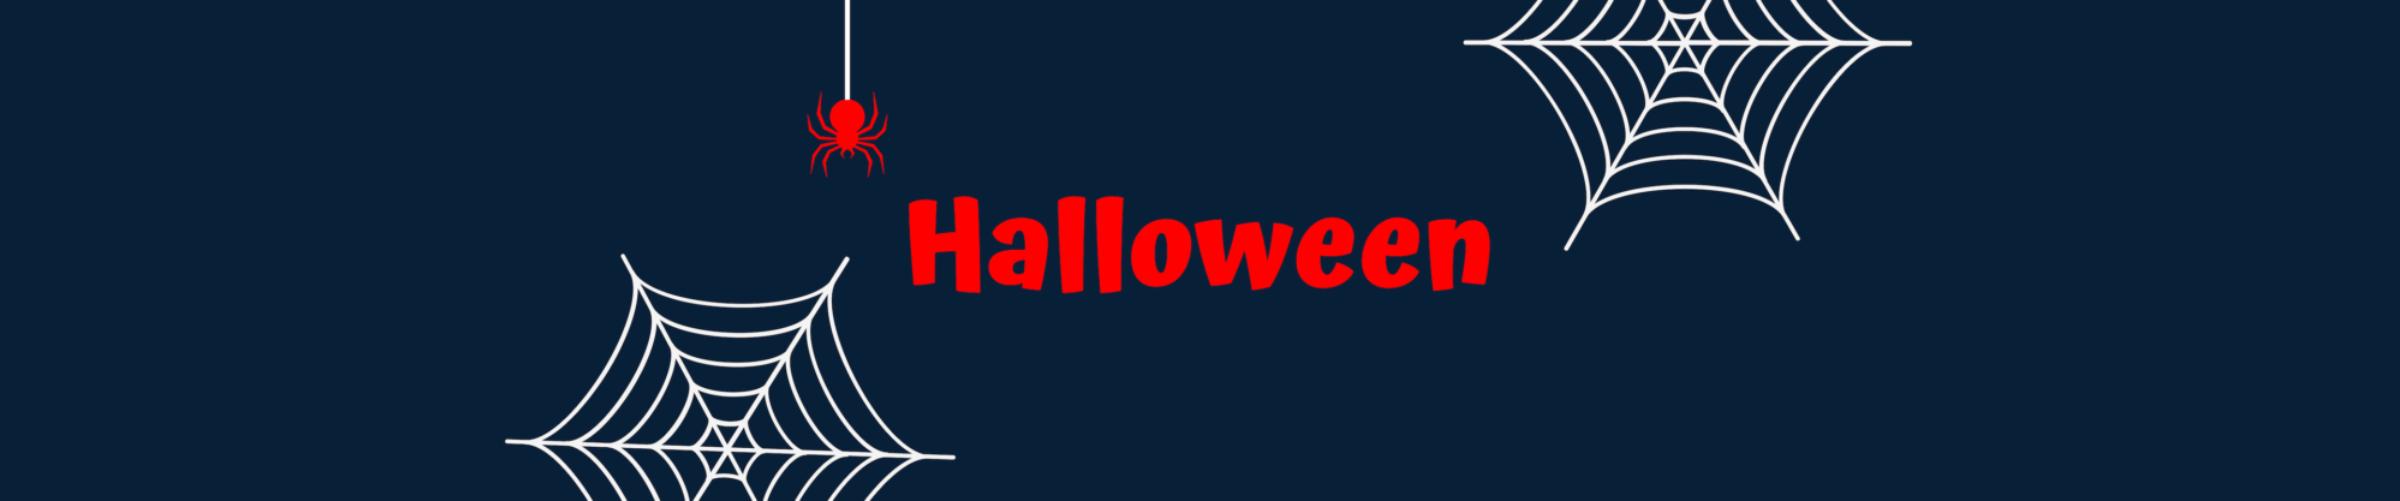 Halloween blog3 1586 1539761728 35ht4mqy74